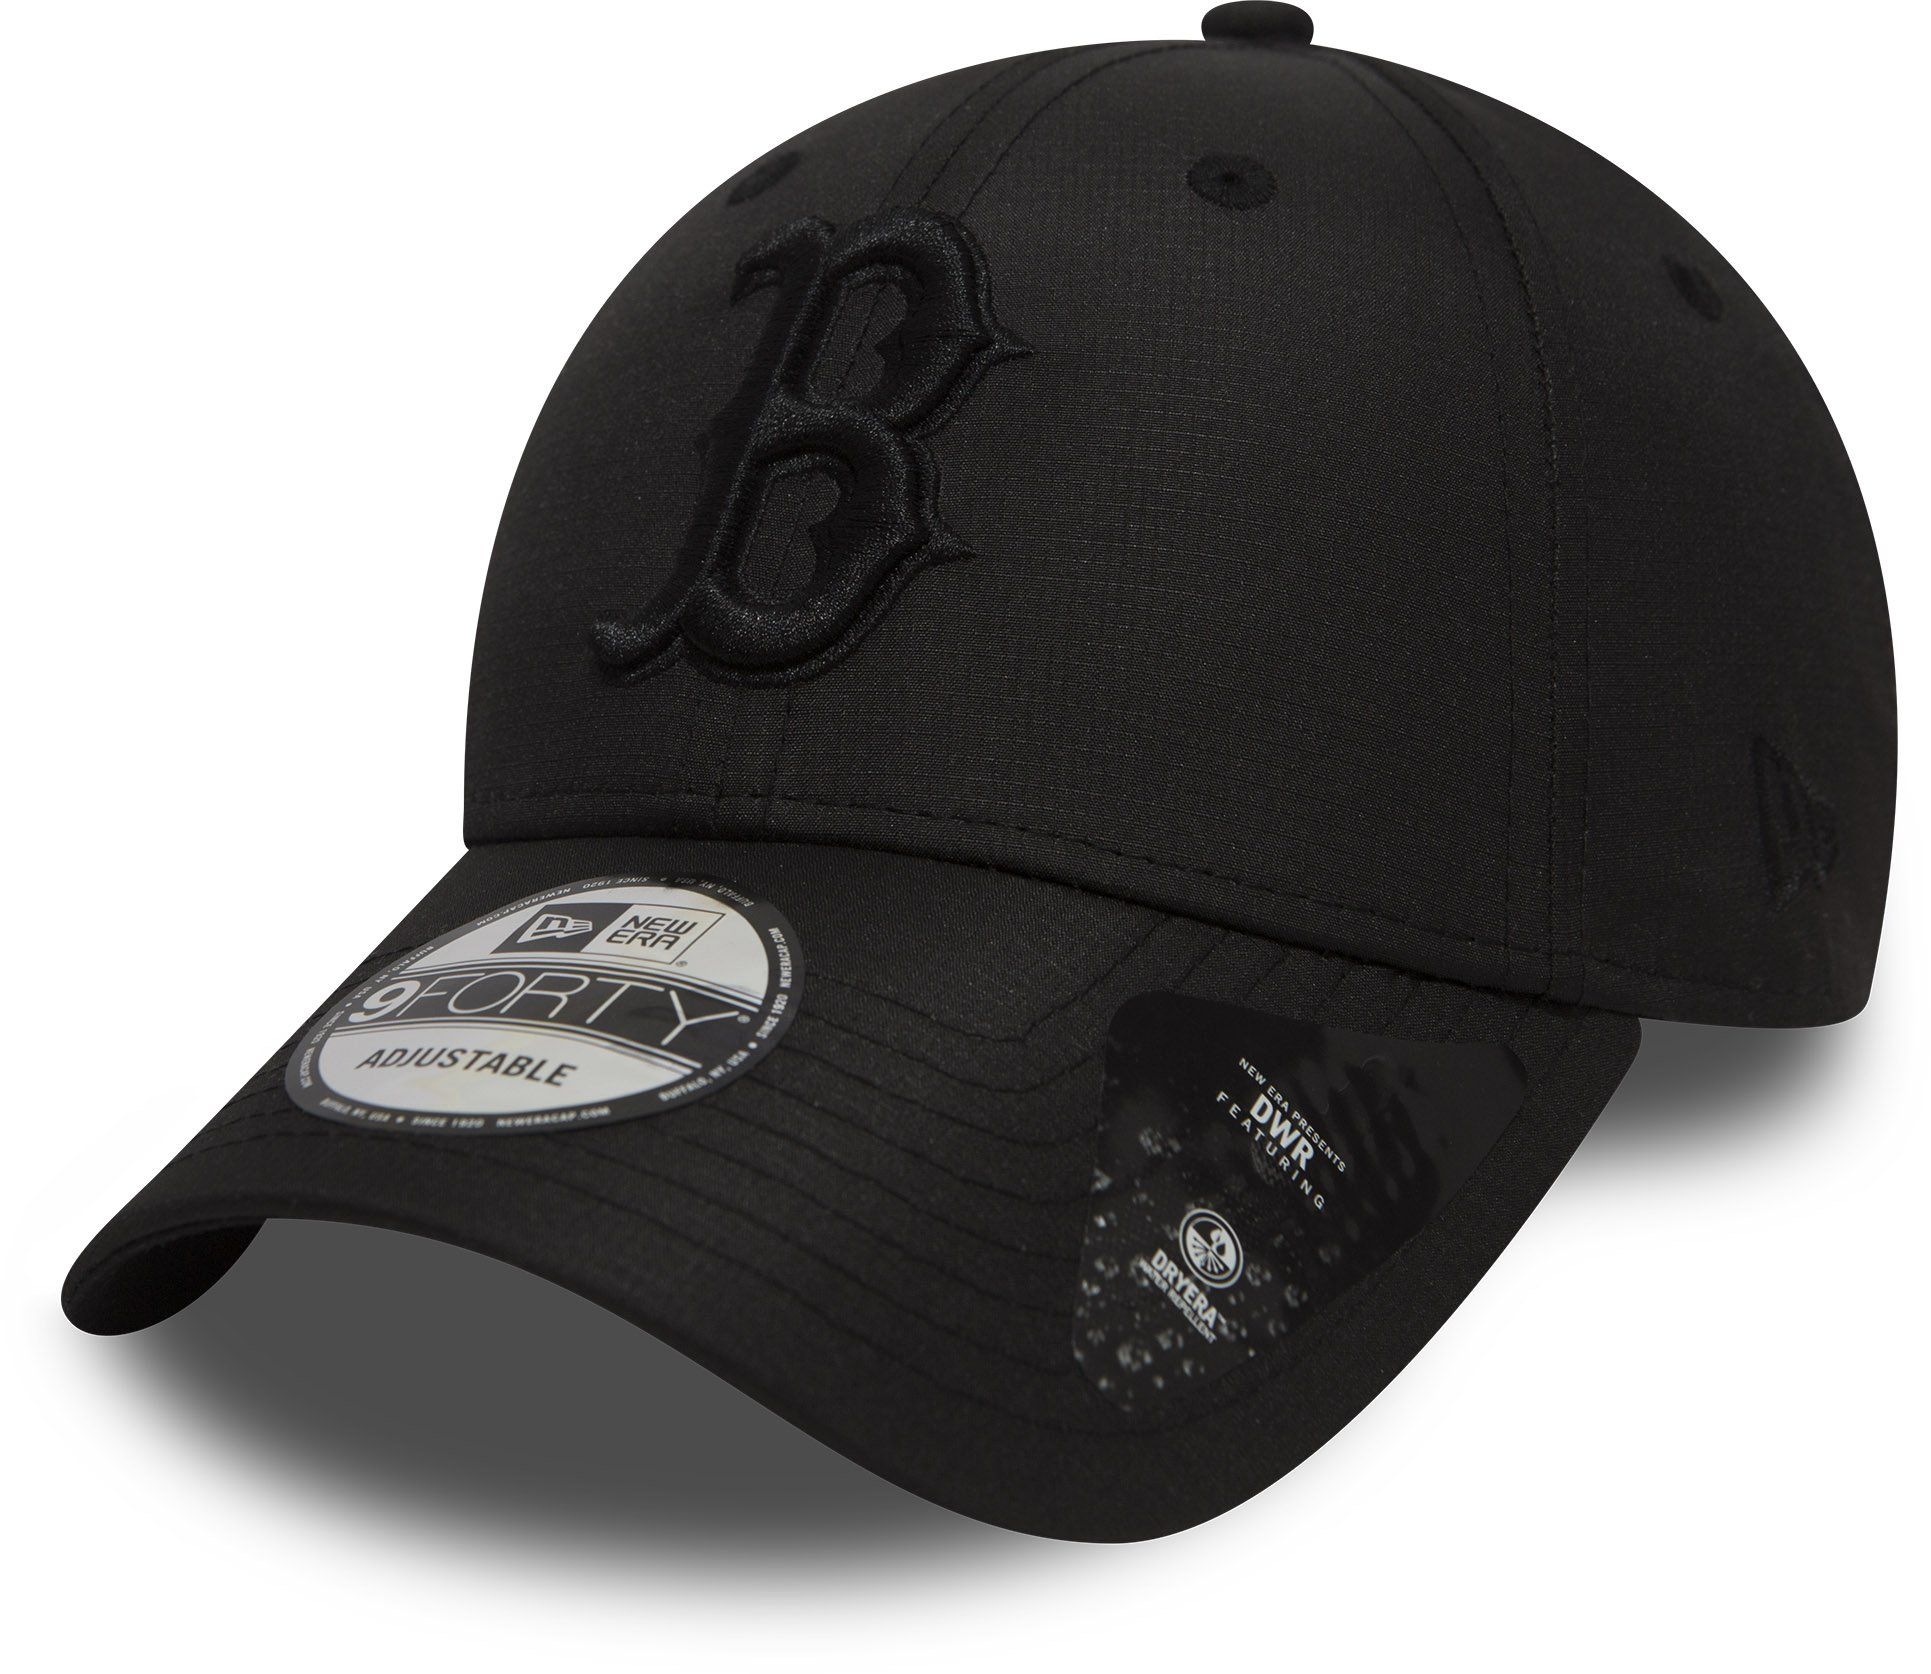 on sale 5f567 a82b8 Boston Red Sox New Era 940 Ripstop Baseball Cap – lovemycap